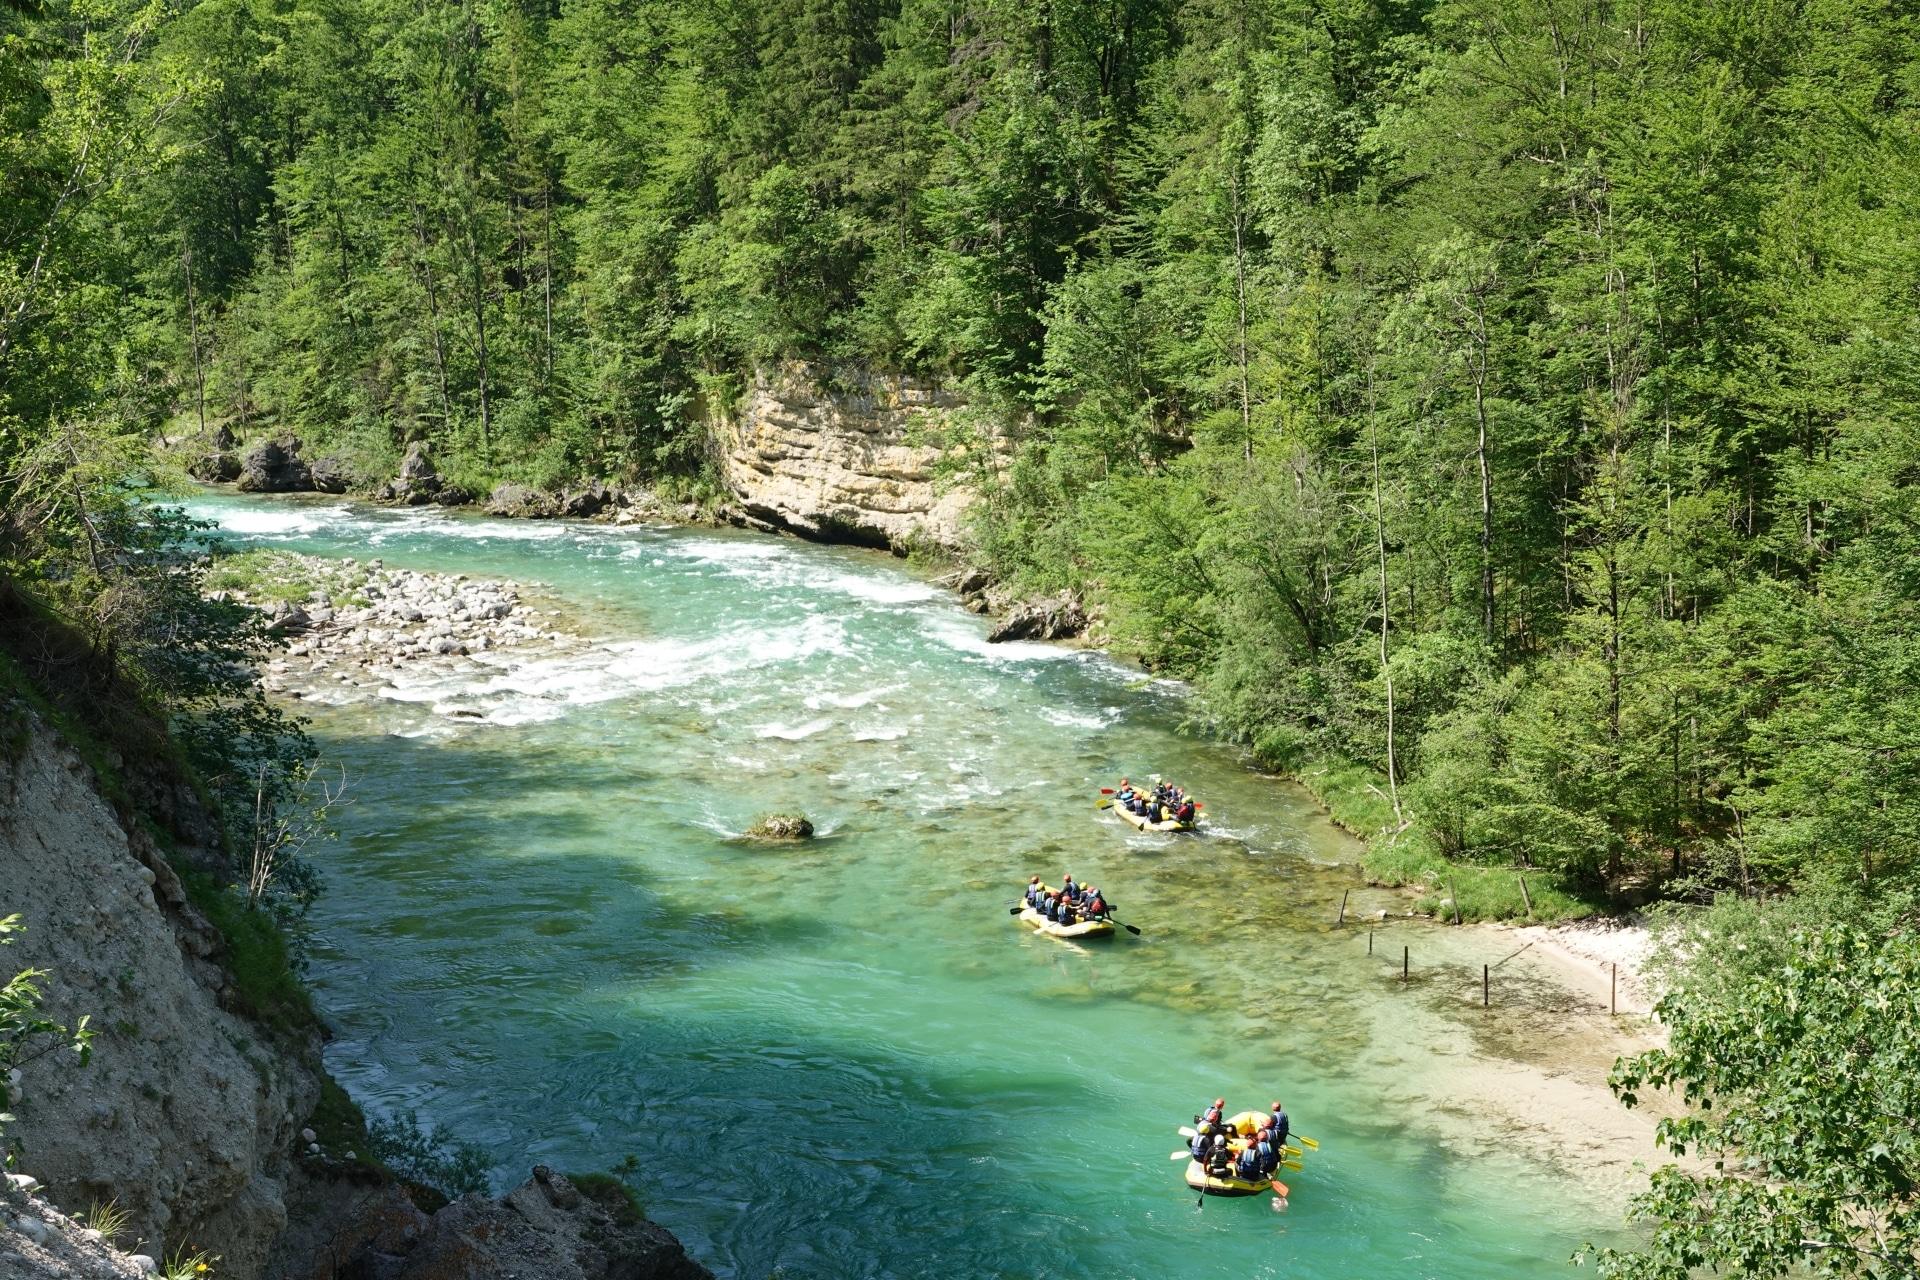 Rafting Niederösterreich/Göstling